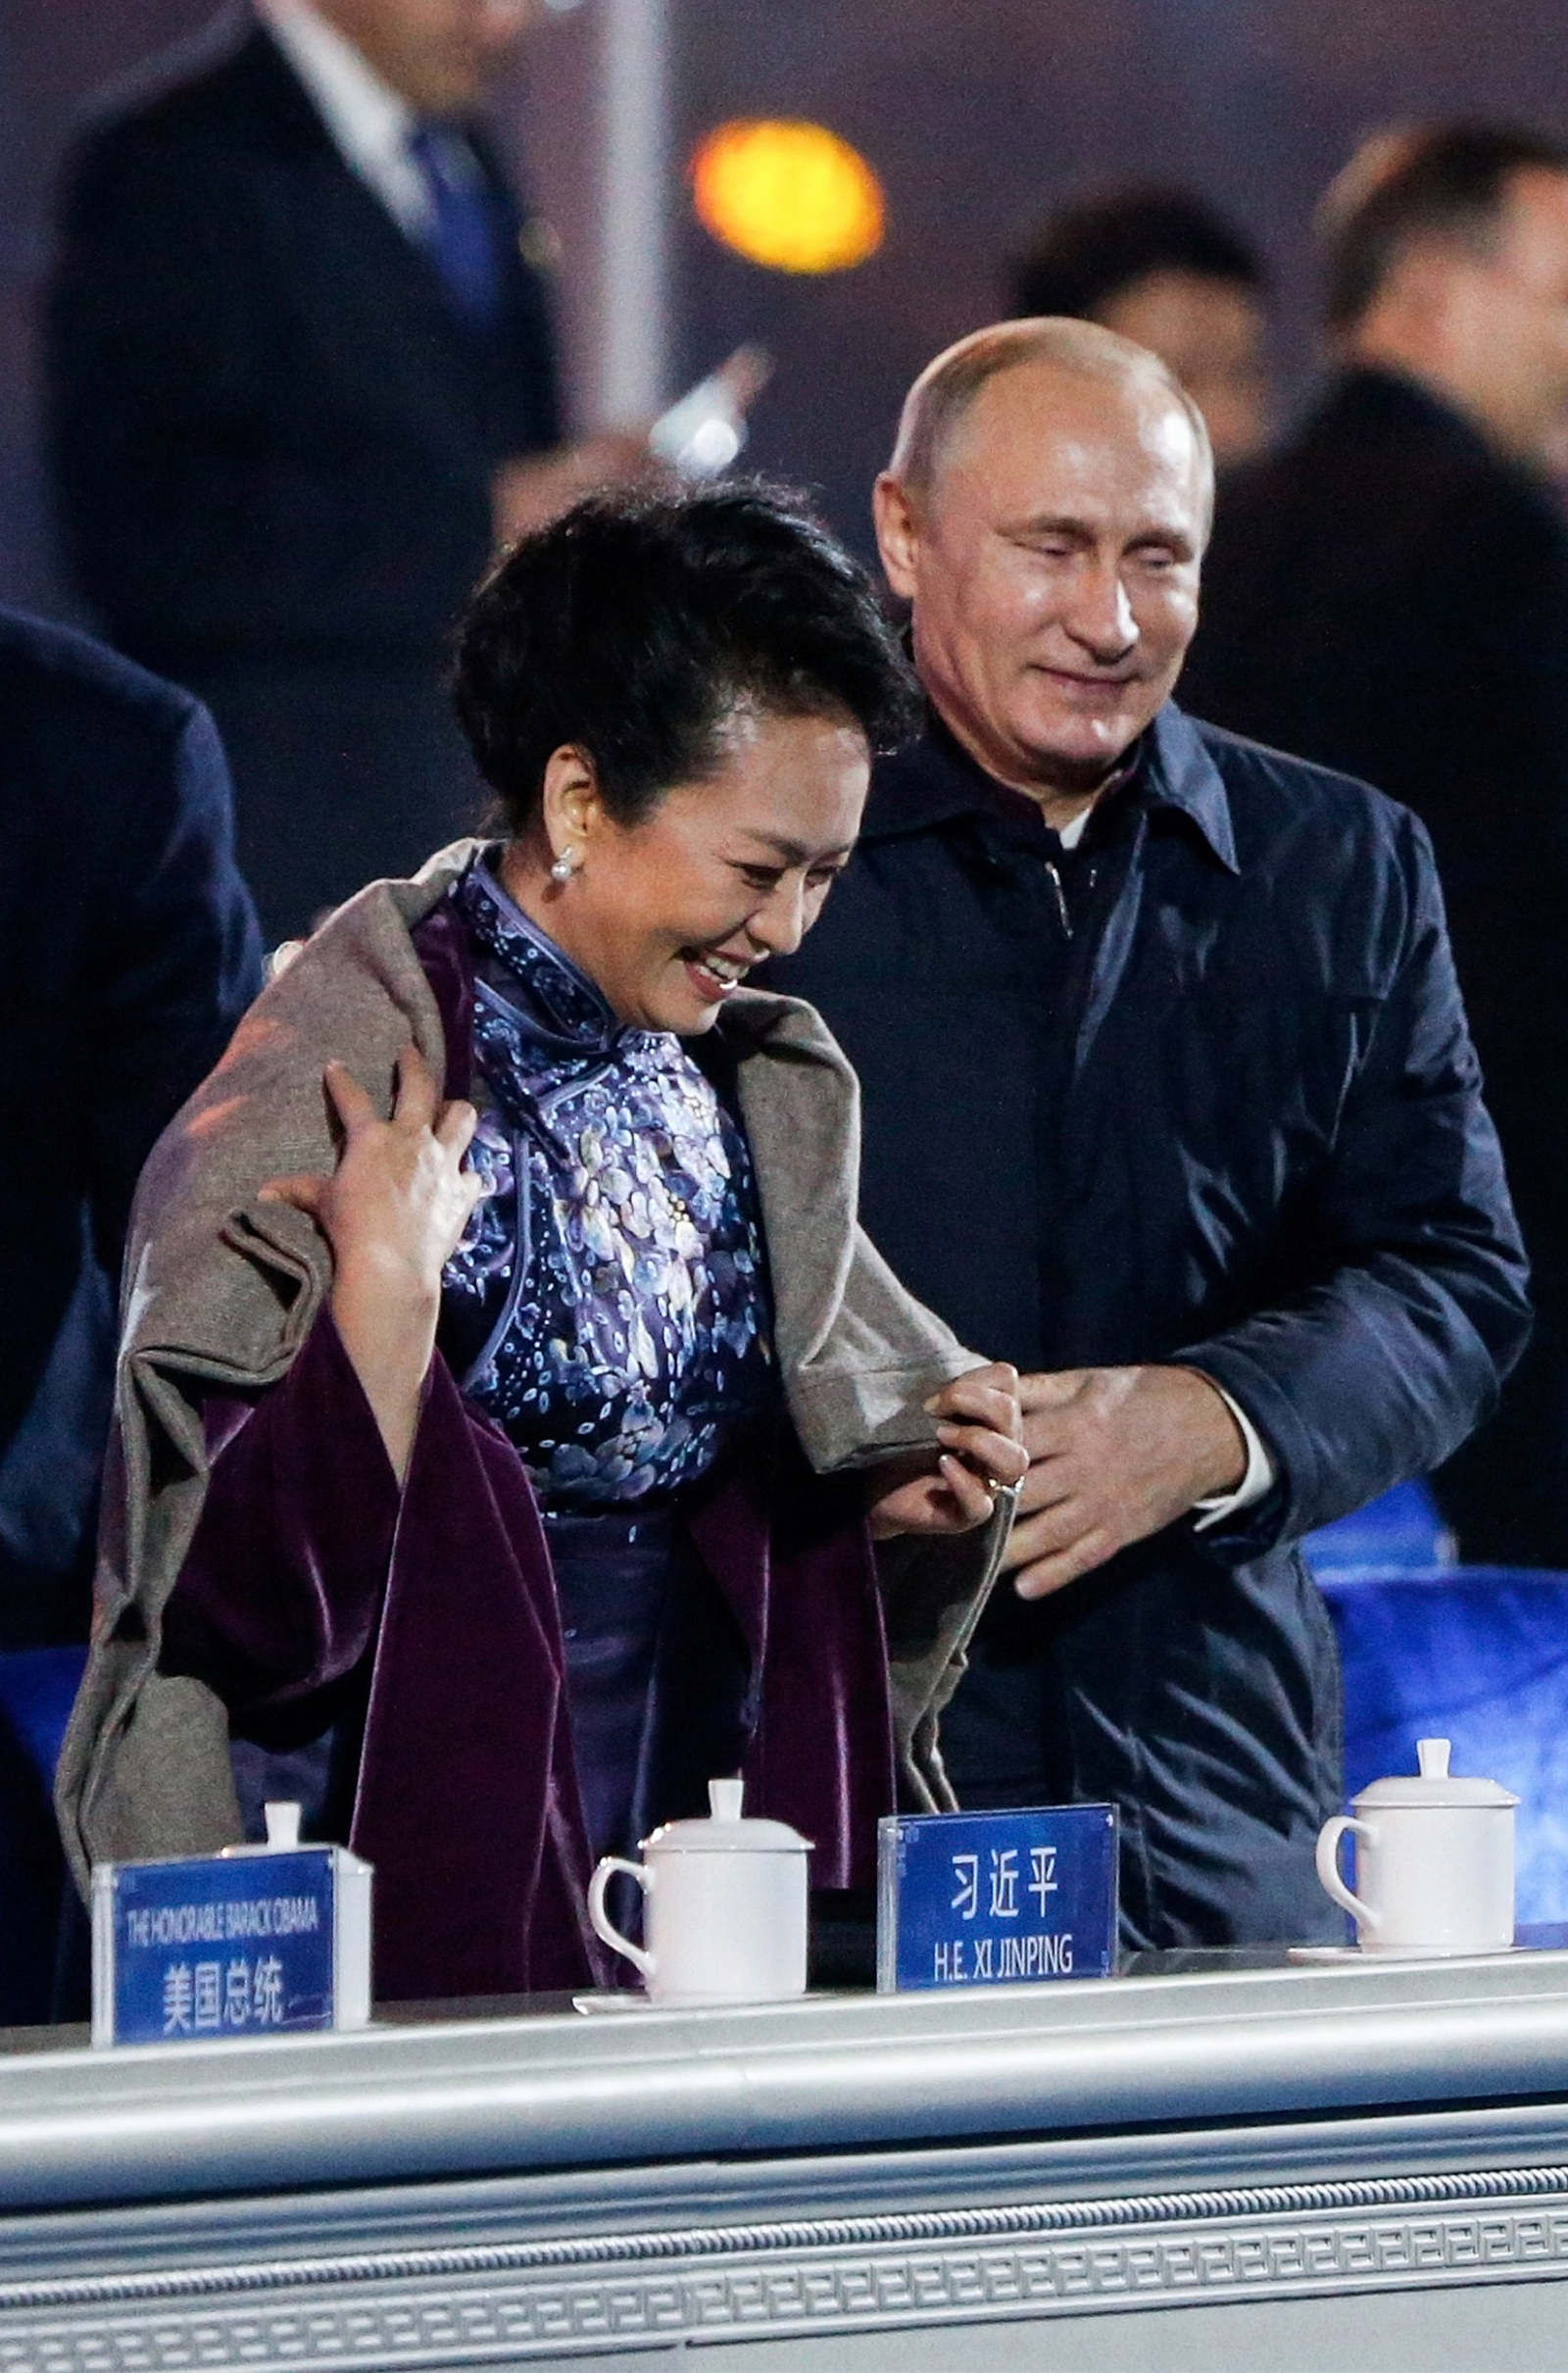 Peng Liyuan Xi Jinping Vladimir Putin Coat Blanket